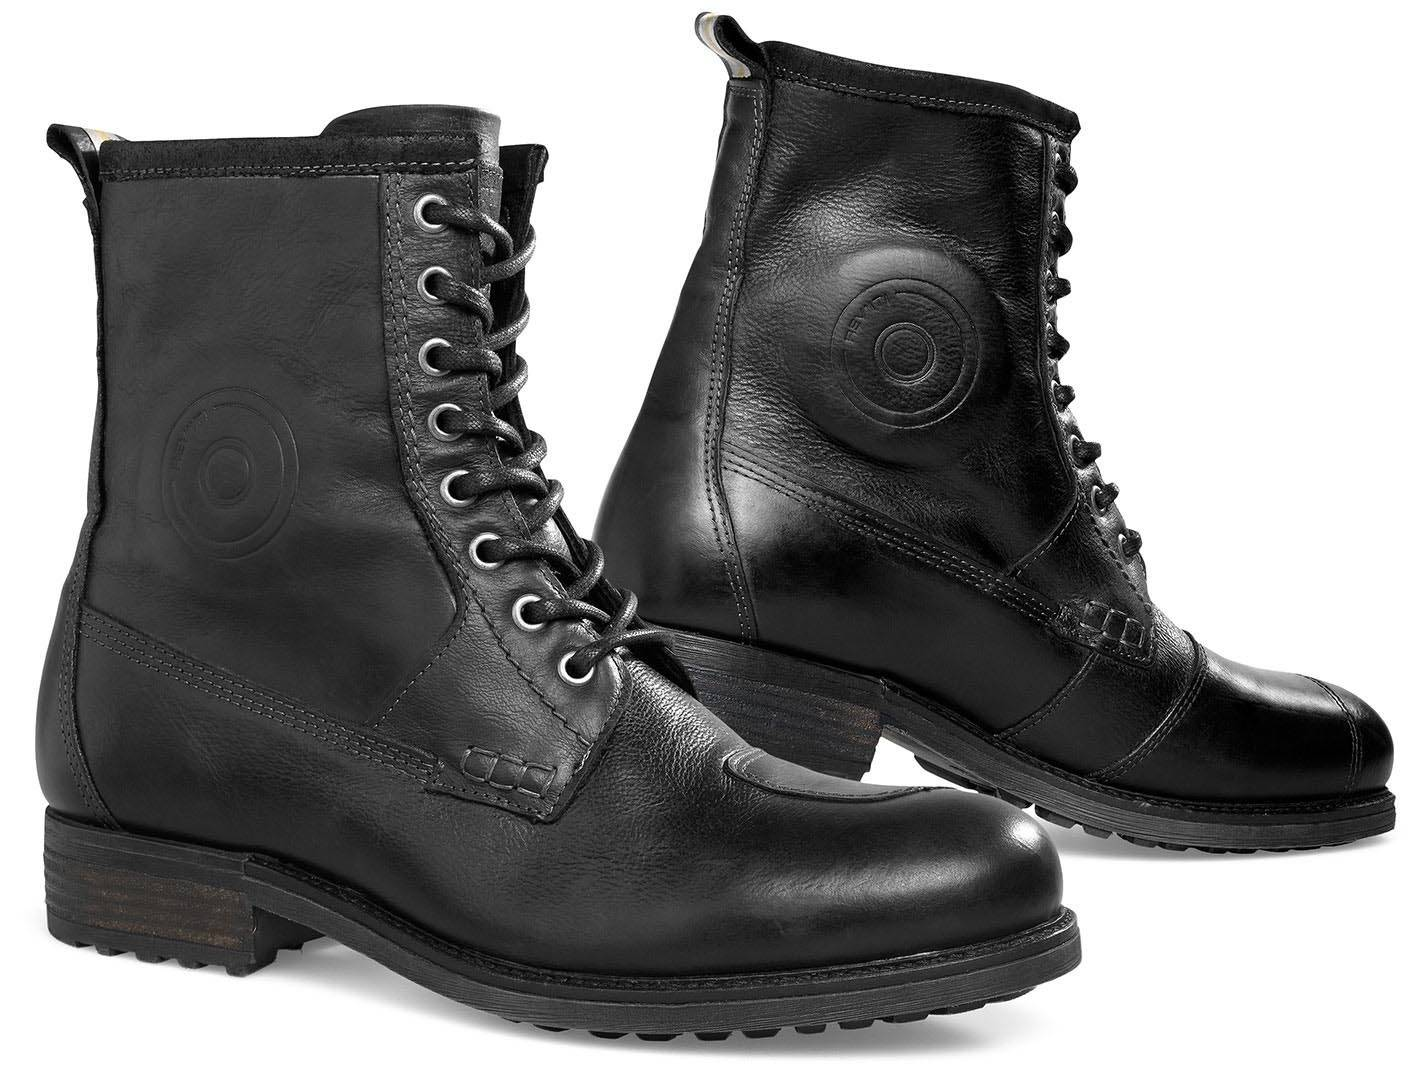 Revit Rodeo Boots Black 44